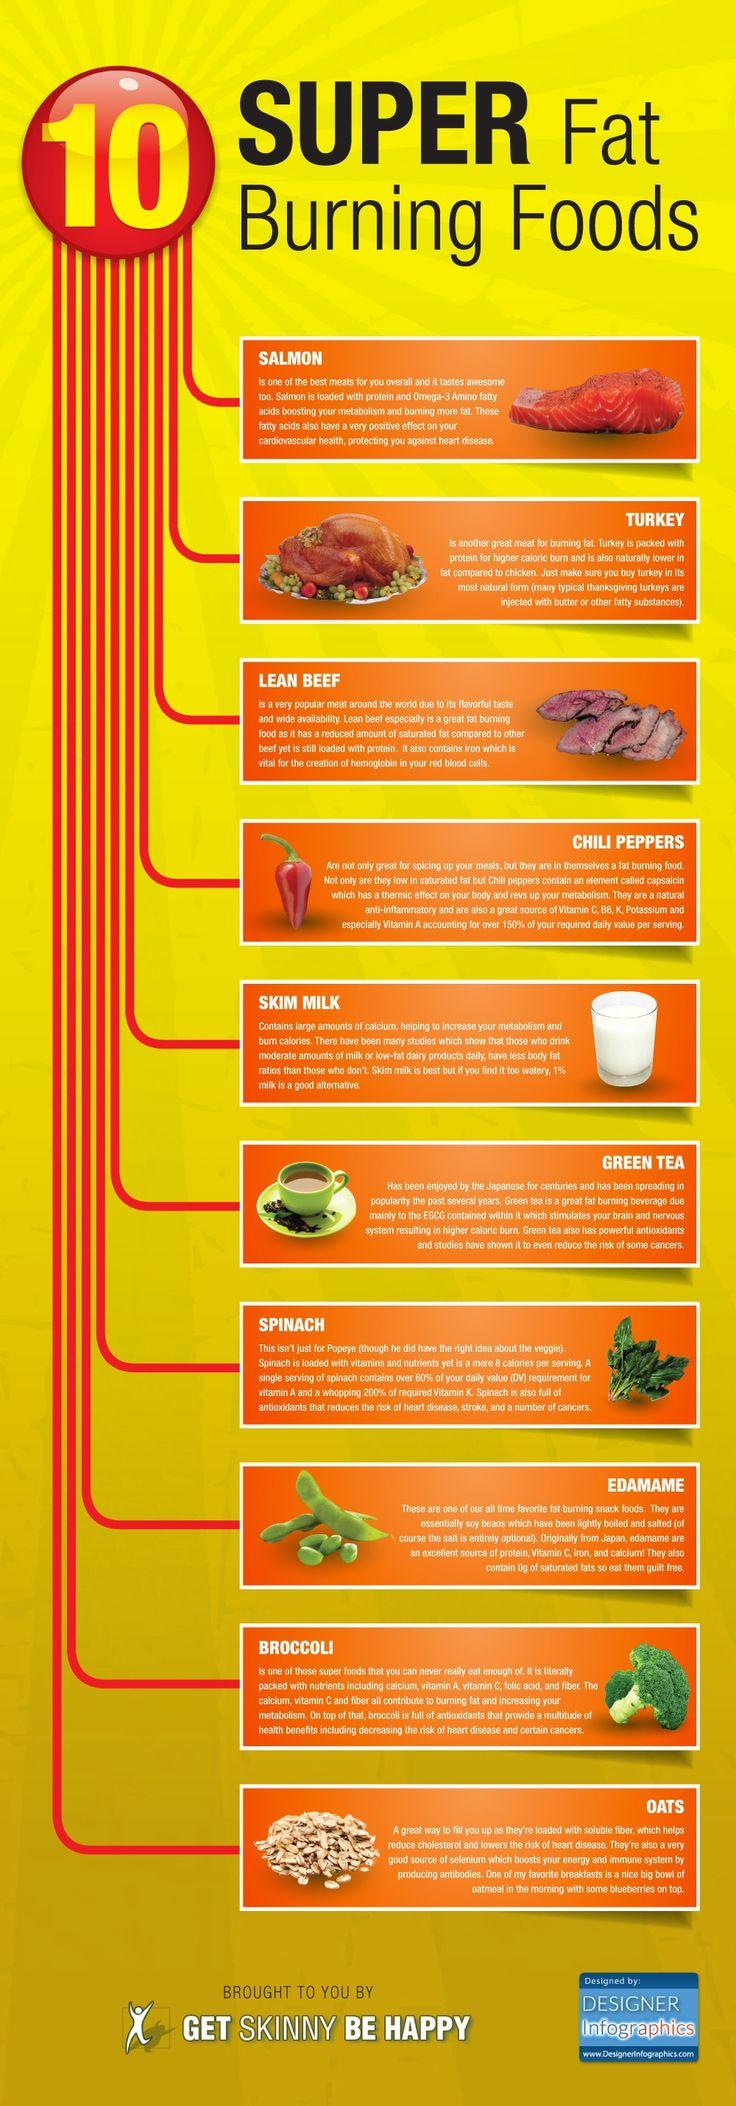 10 Super #FatBurning #Foods #Infographic